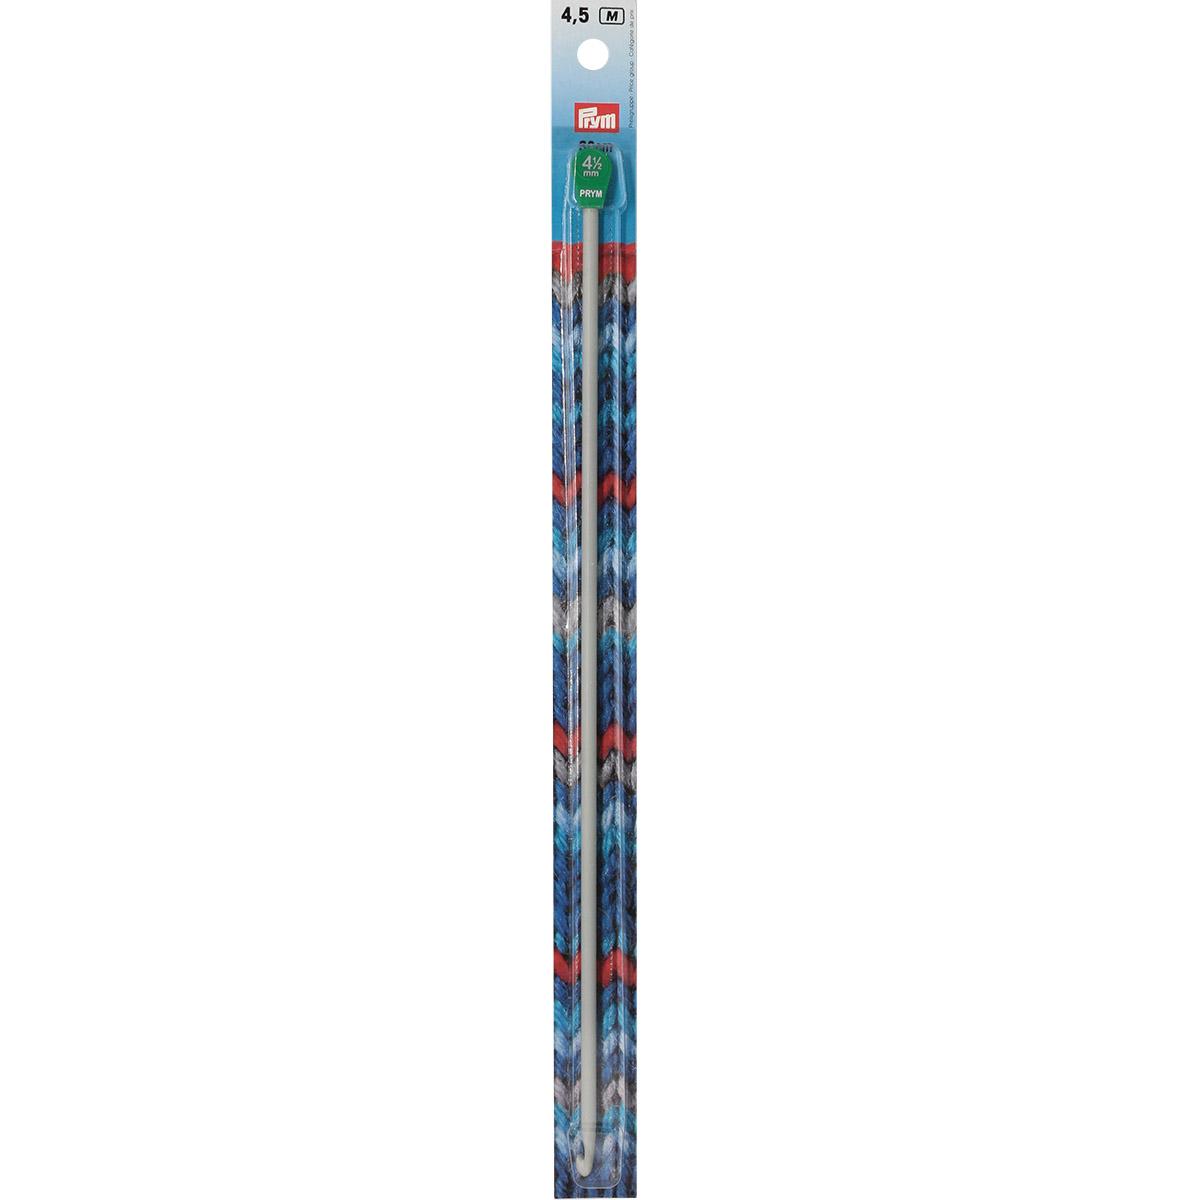 195218 Крючок для вязания тунисский, 4,5 мм*30 см, Prym